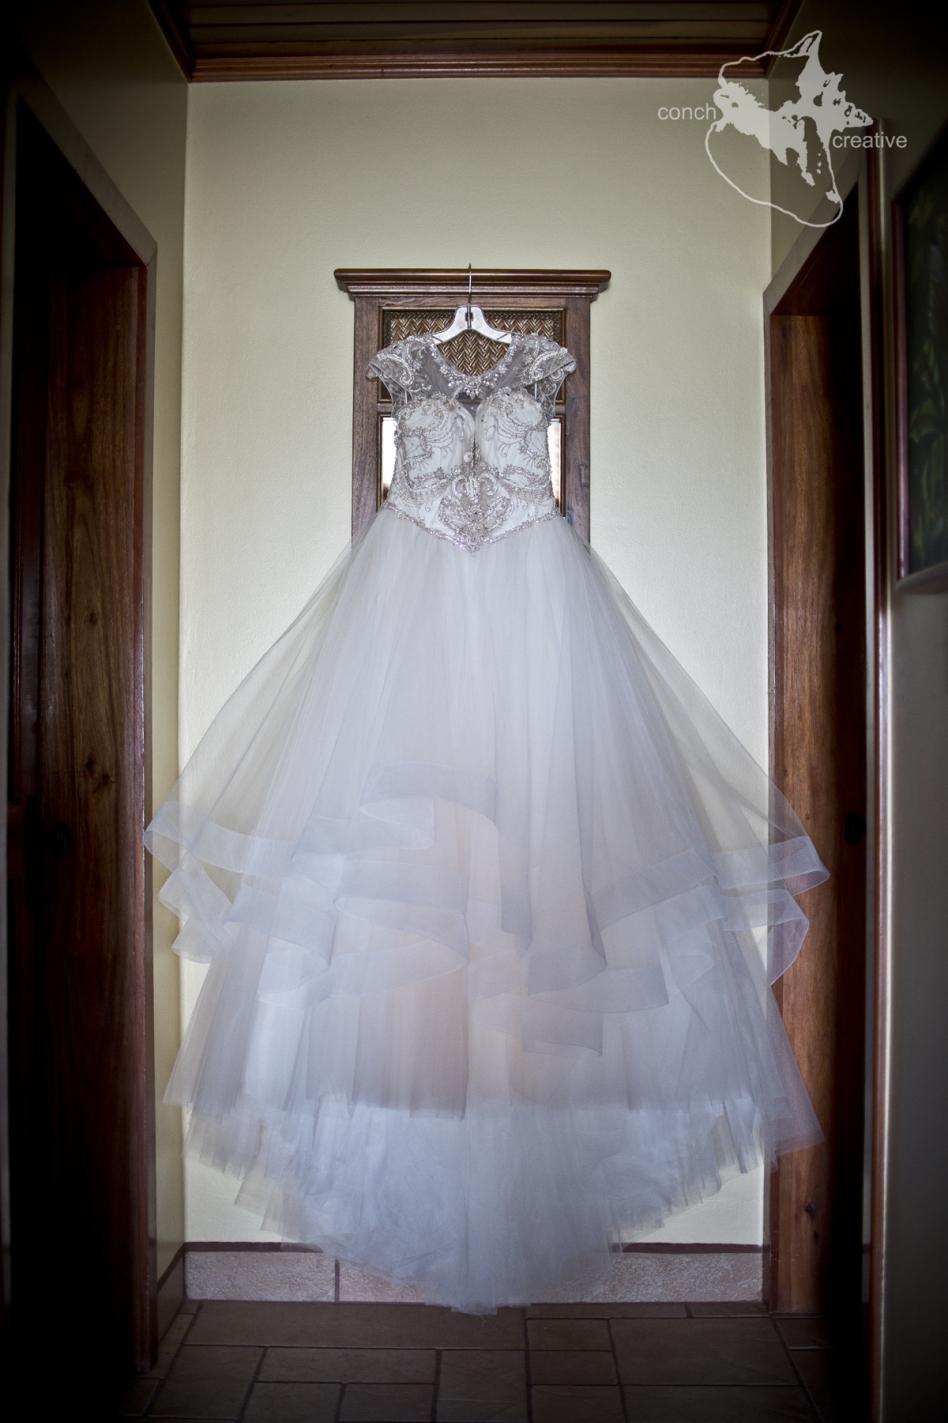 Belize Wedding Dress